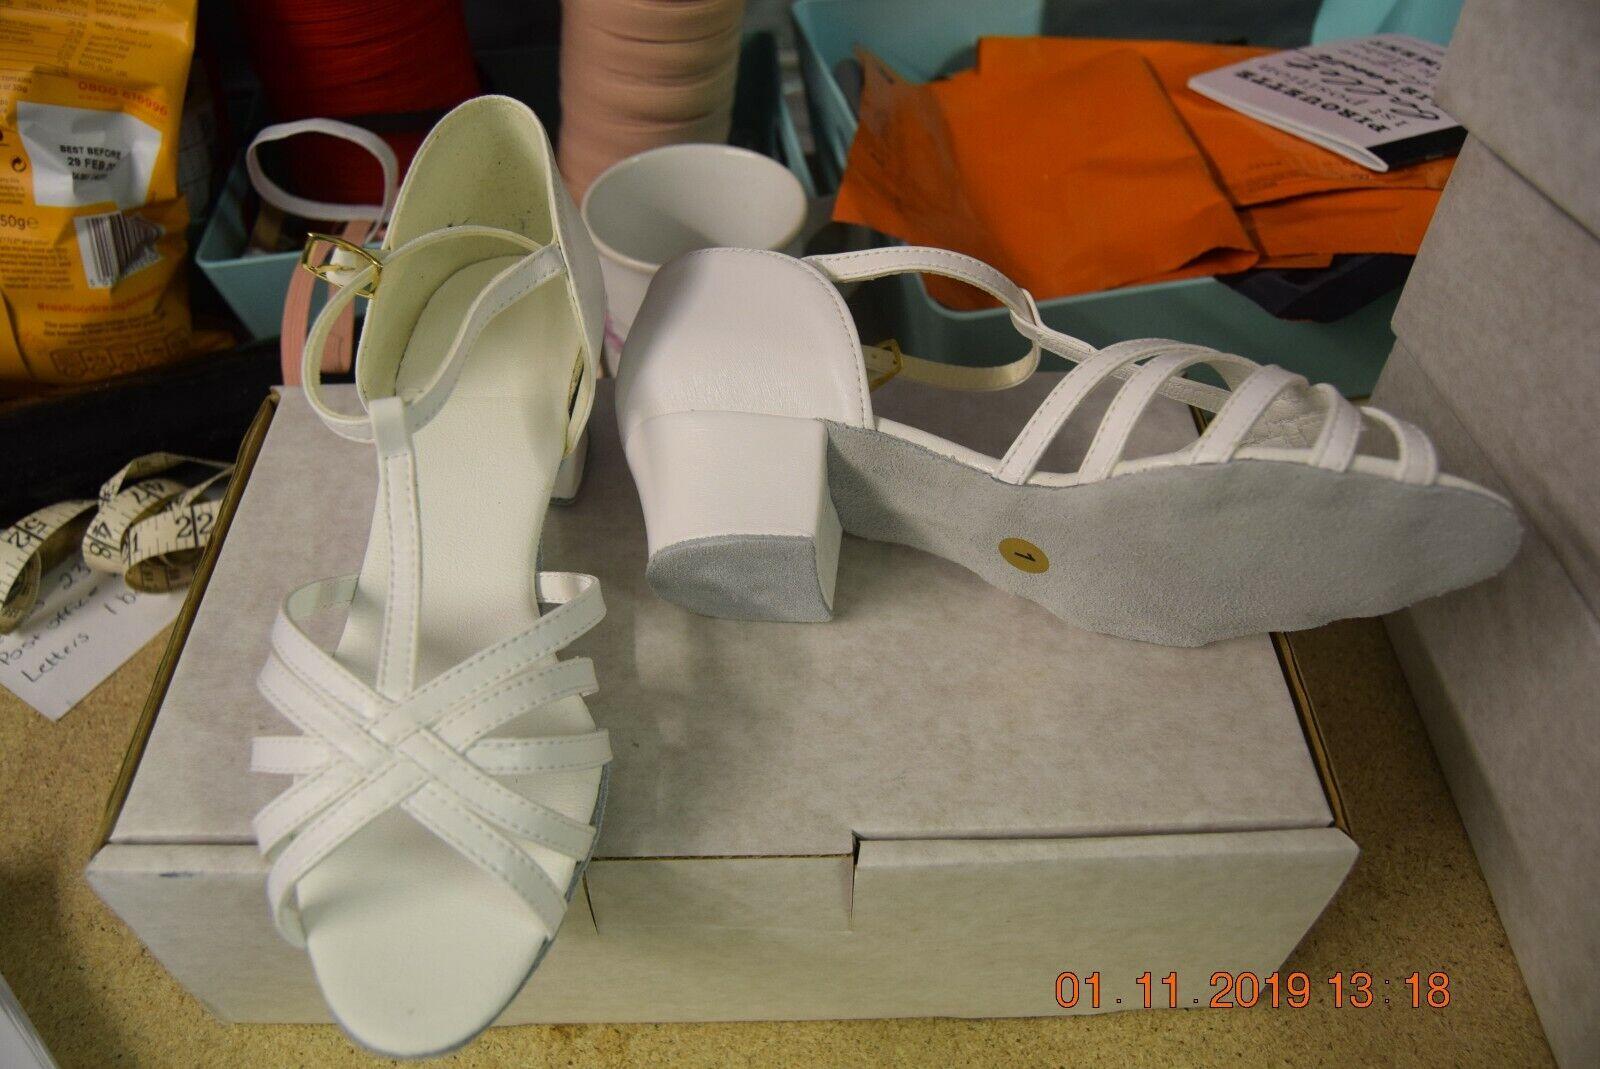 White Lexie dance depot ballroom/latin dance shoes